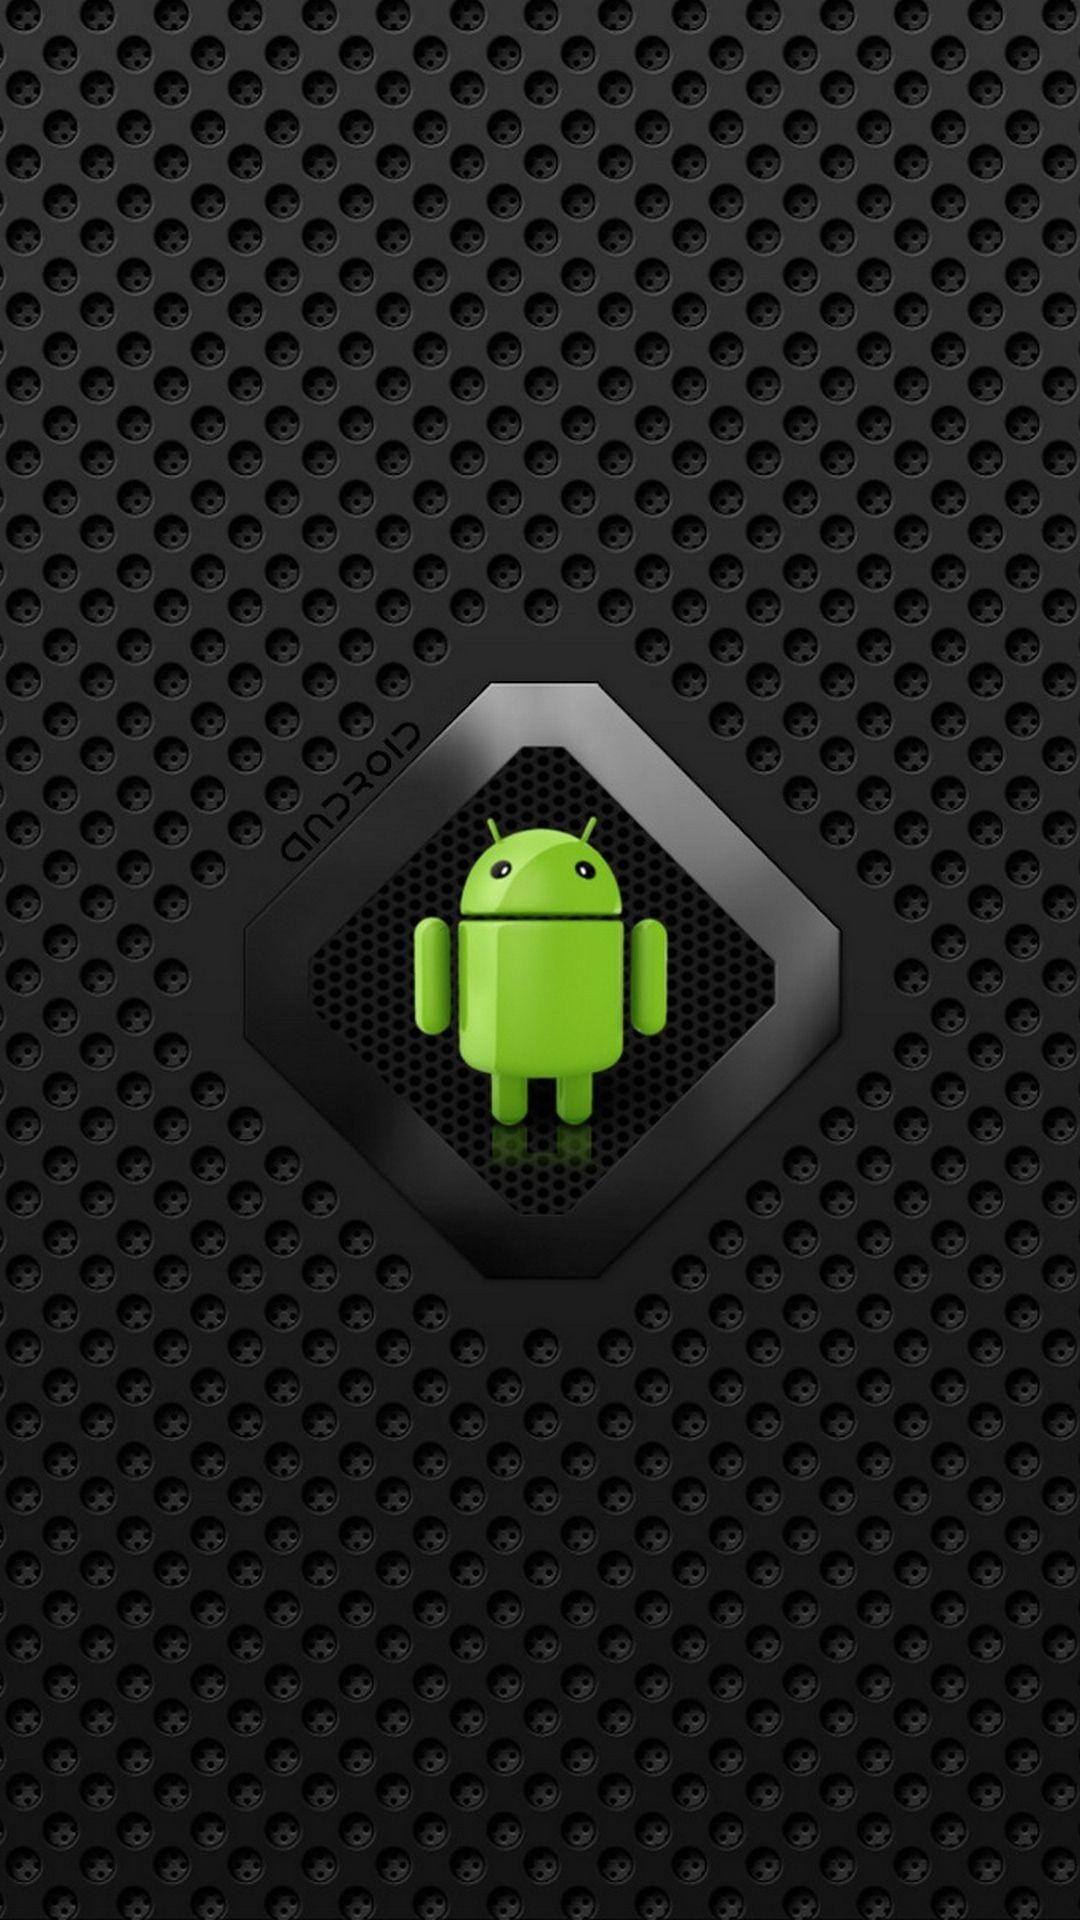 Image Lock Screen